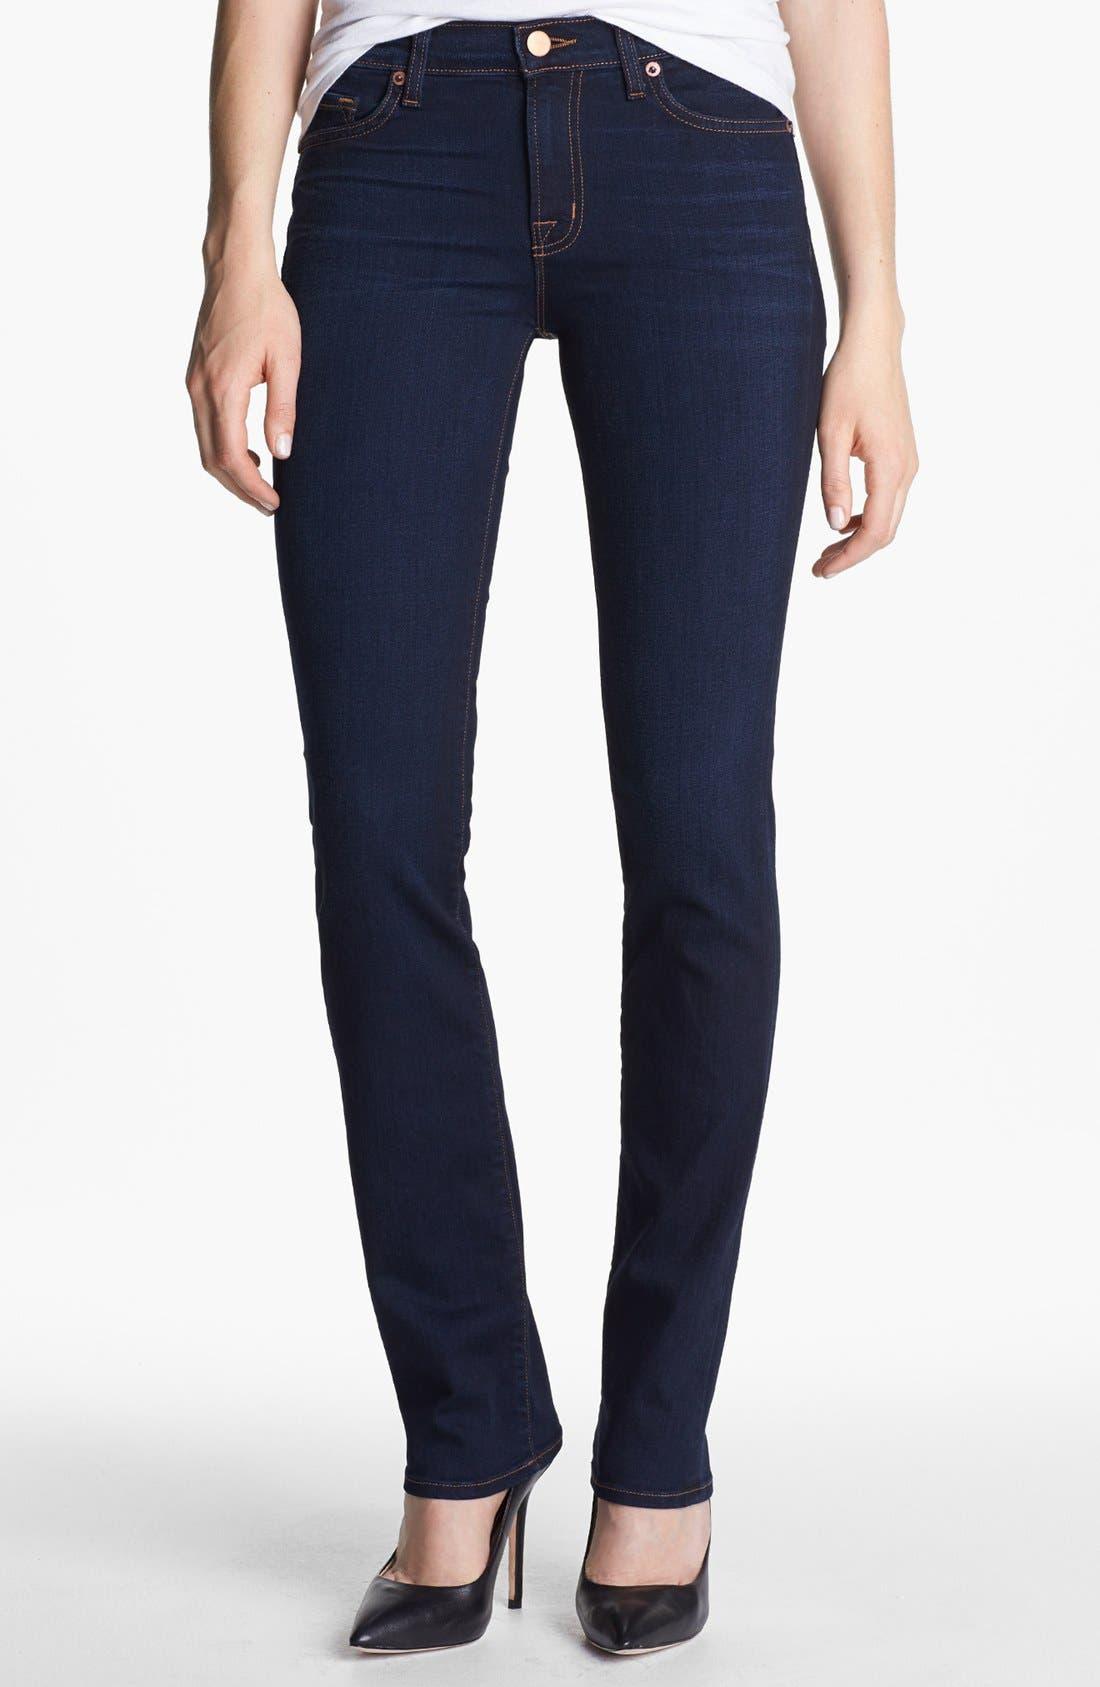 Alternate Image 1 Selected - J Brand '814' Mid-Rise Cigarette Leg Jeans (Ignite)